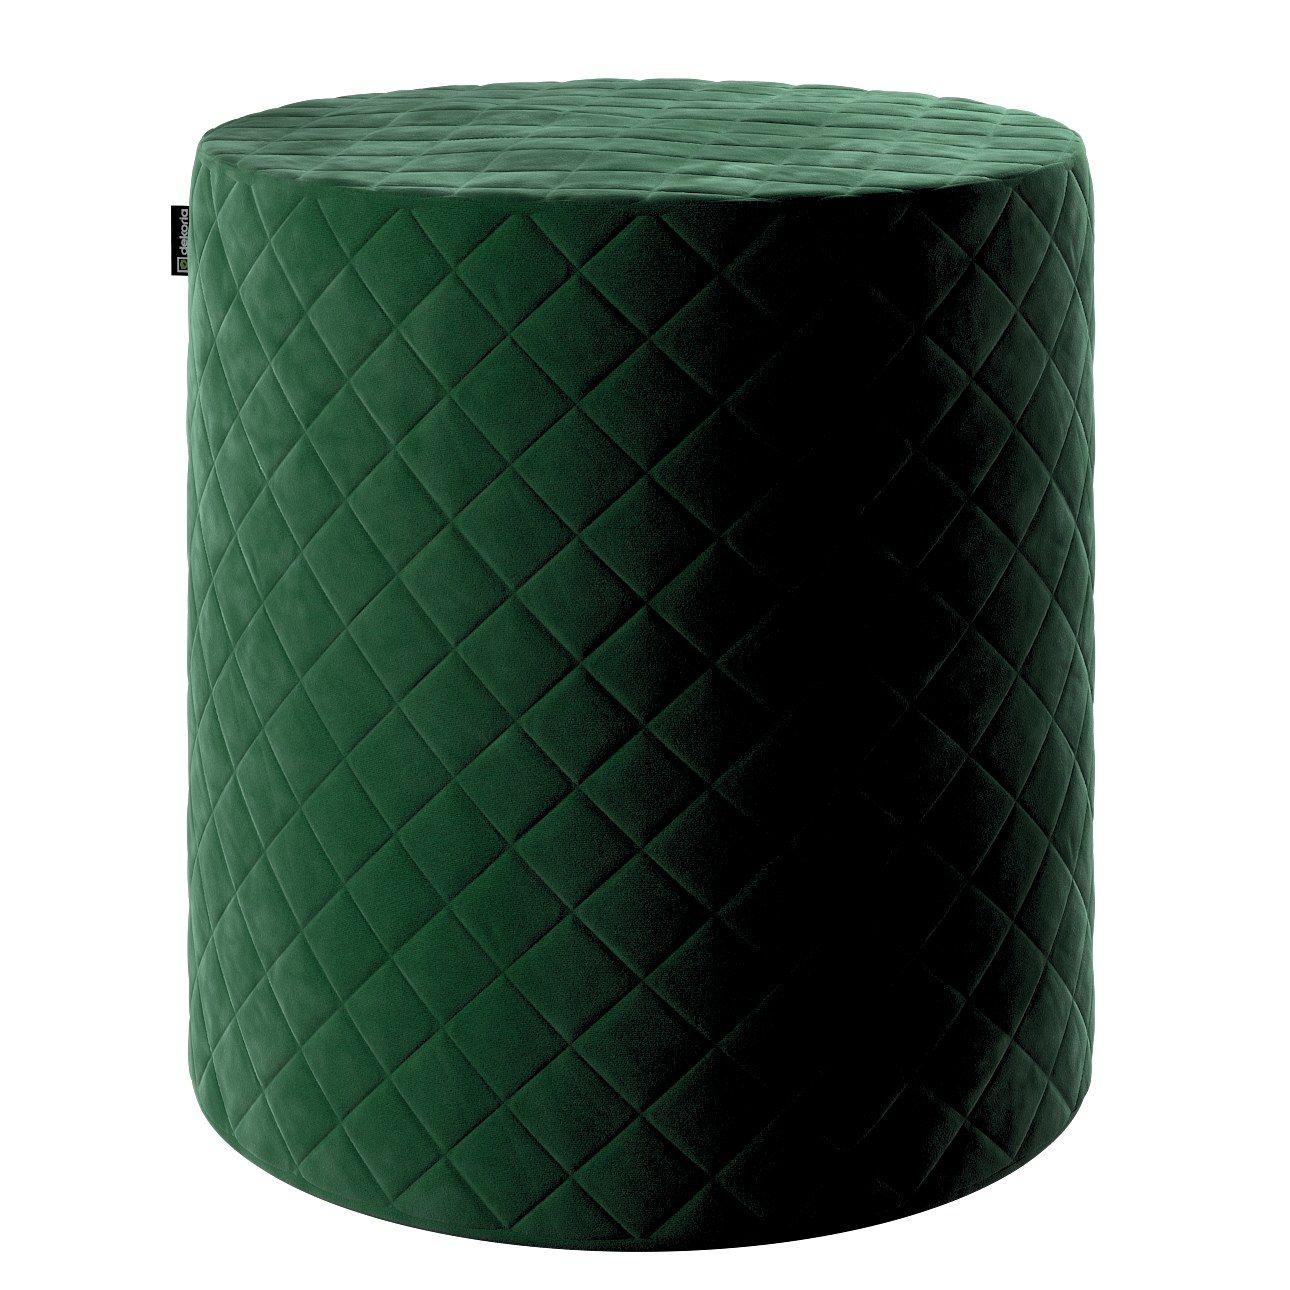 Puff Barrel pikowany jest min. kolorze butelkowej zieleni